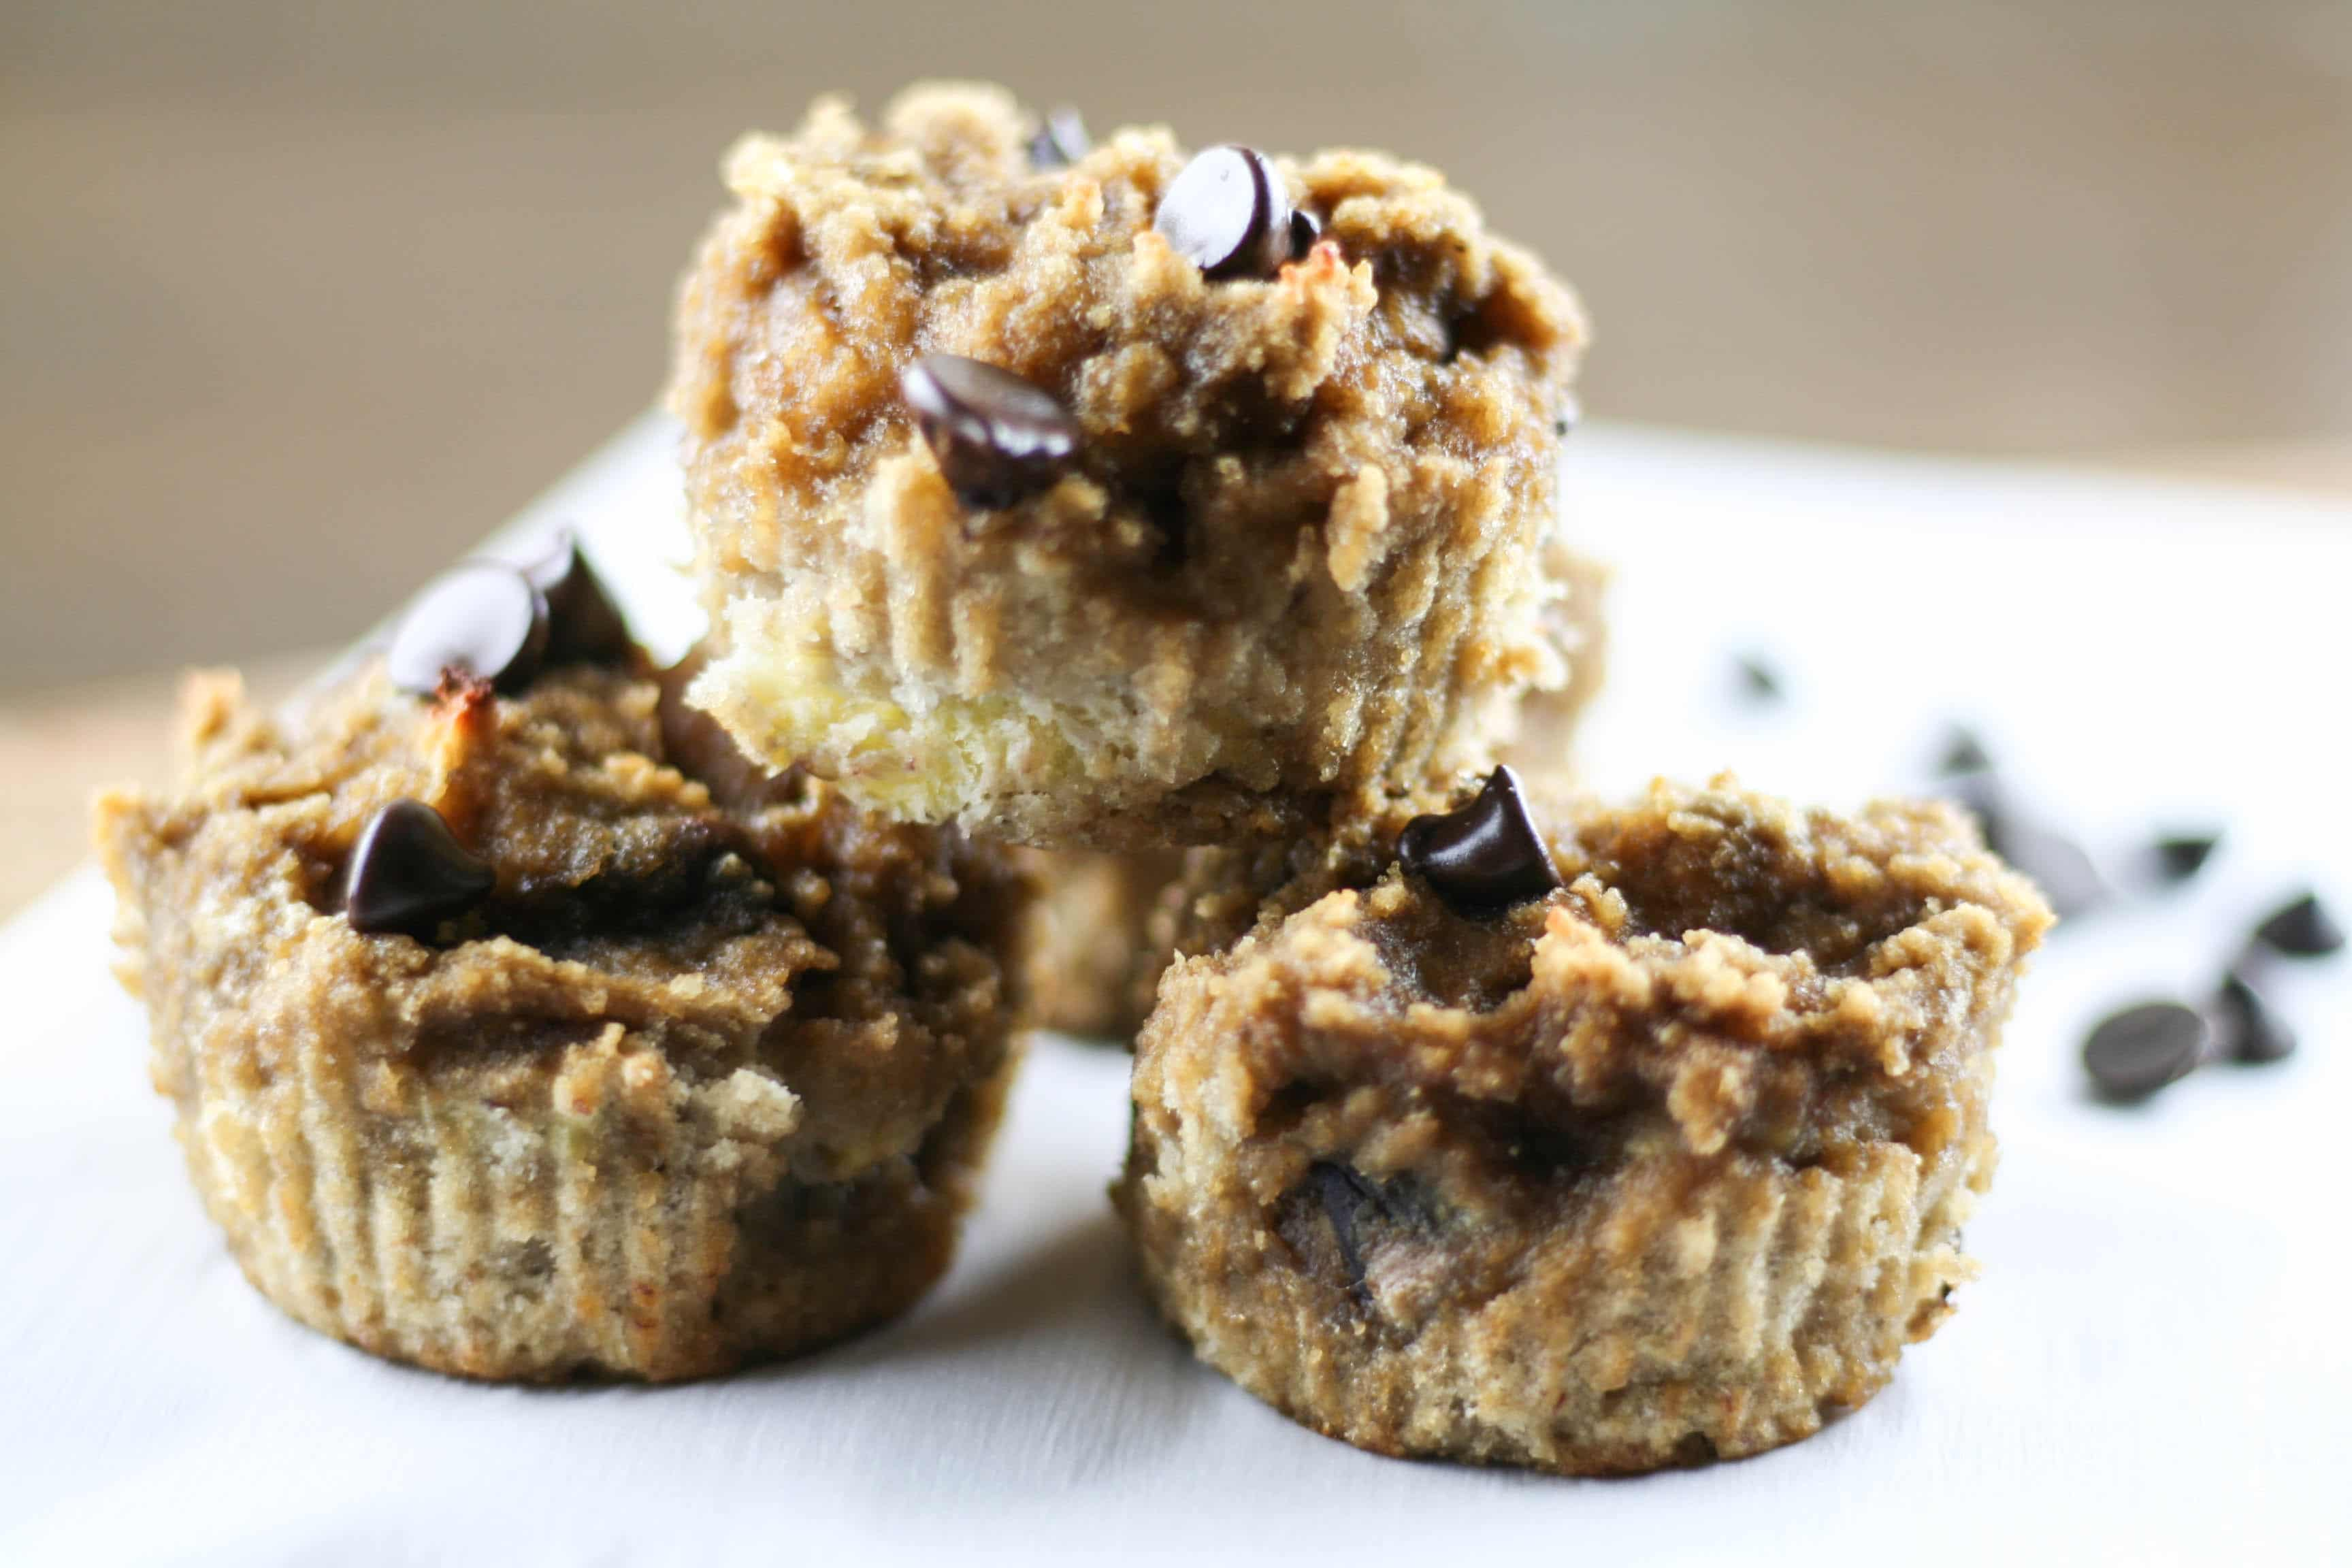 nut-free Paleo banana bread muffin